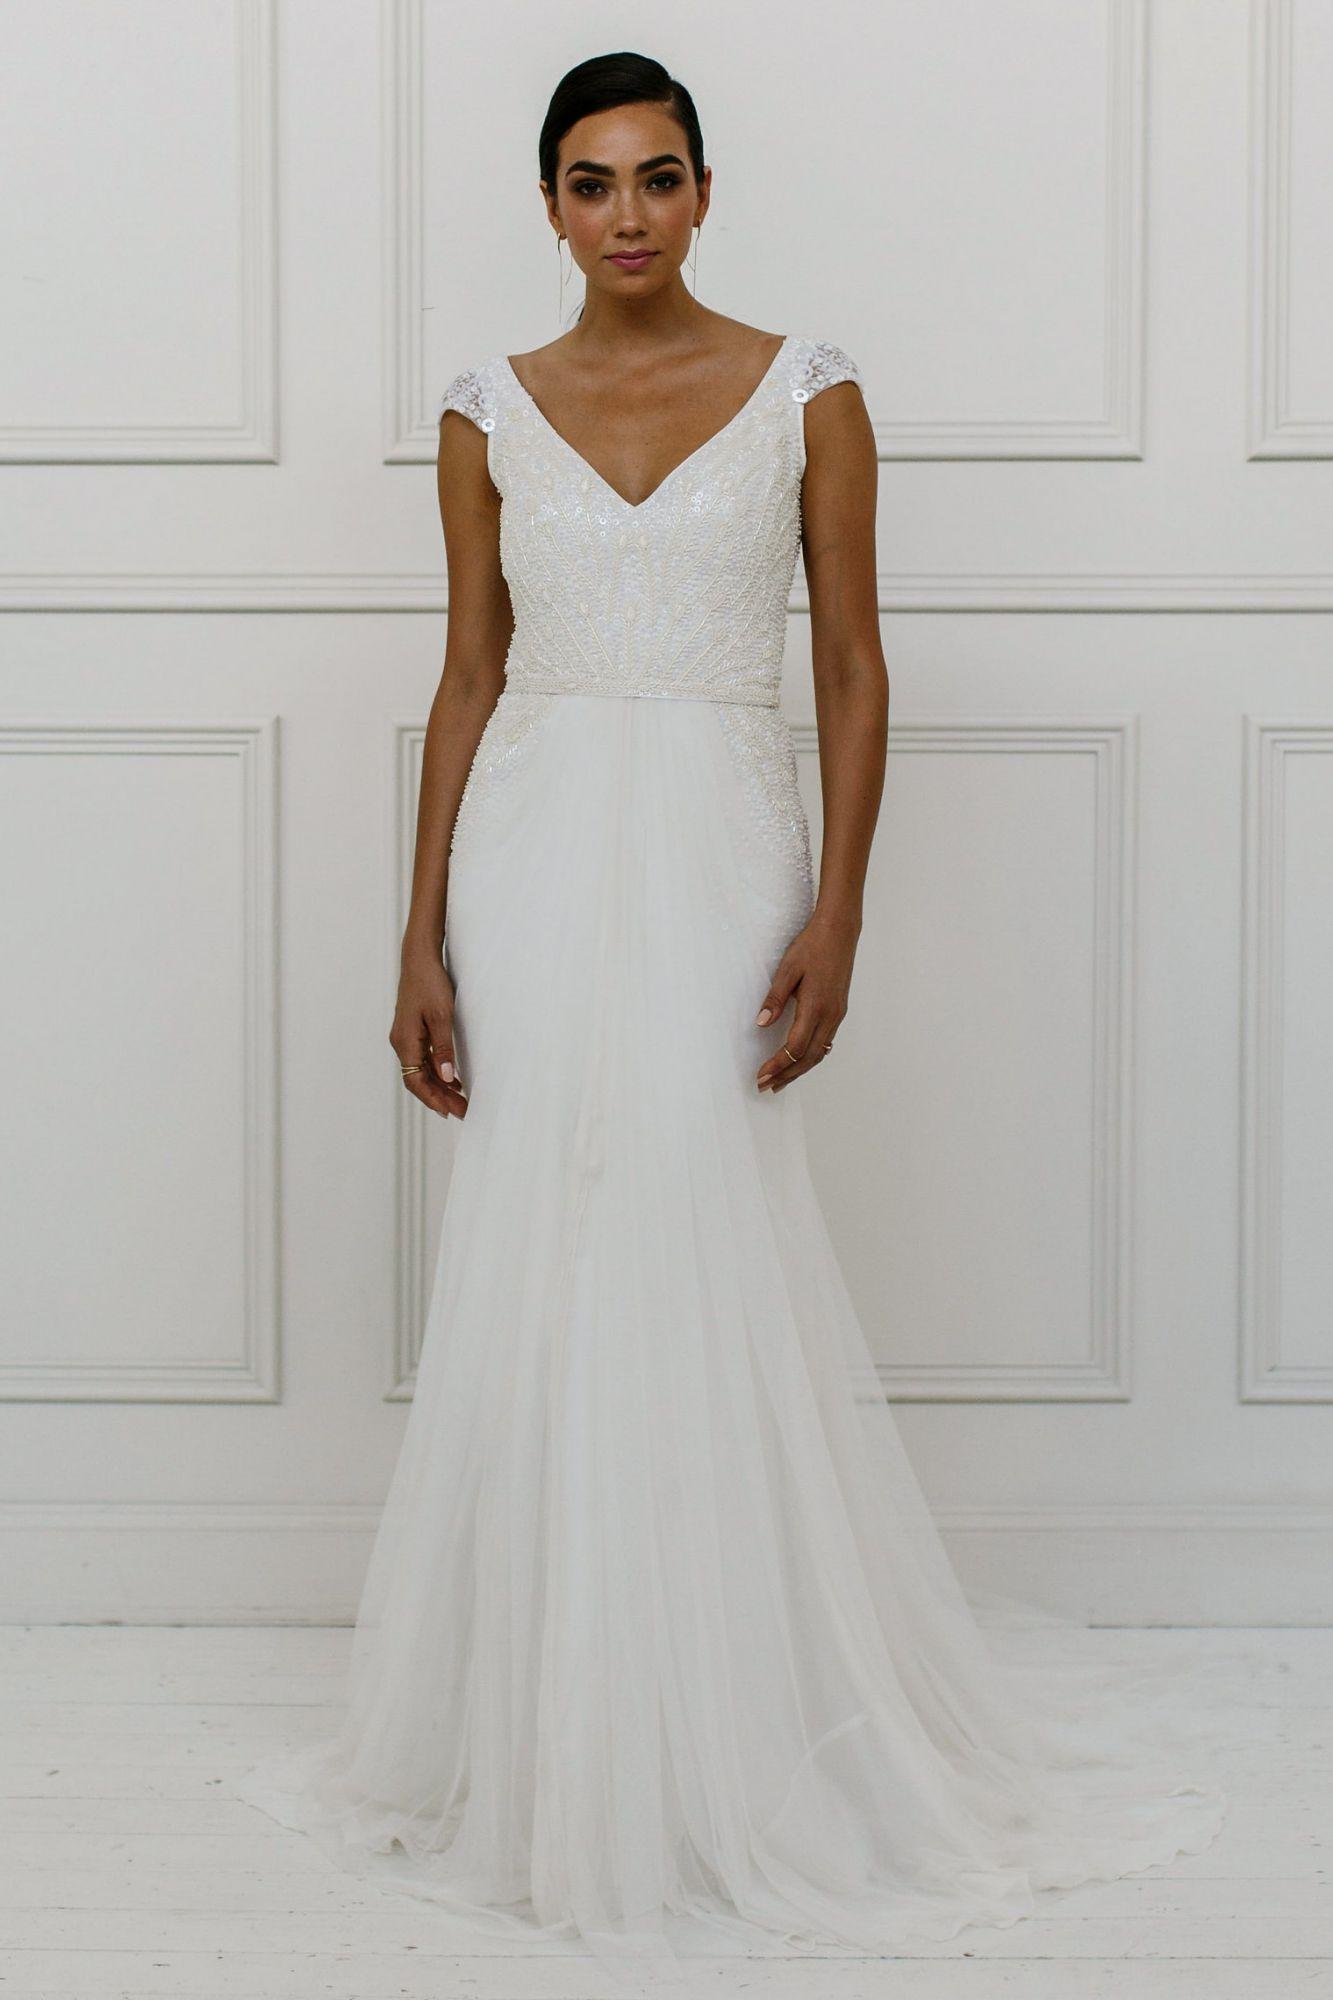 KAREN WILLIS HOLMES Valeria Wedding Dress A soft, figure